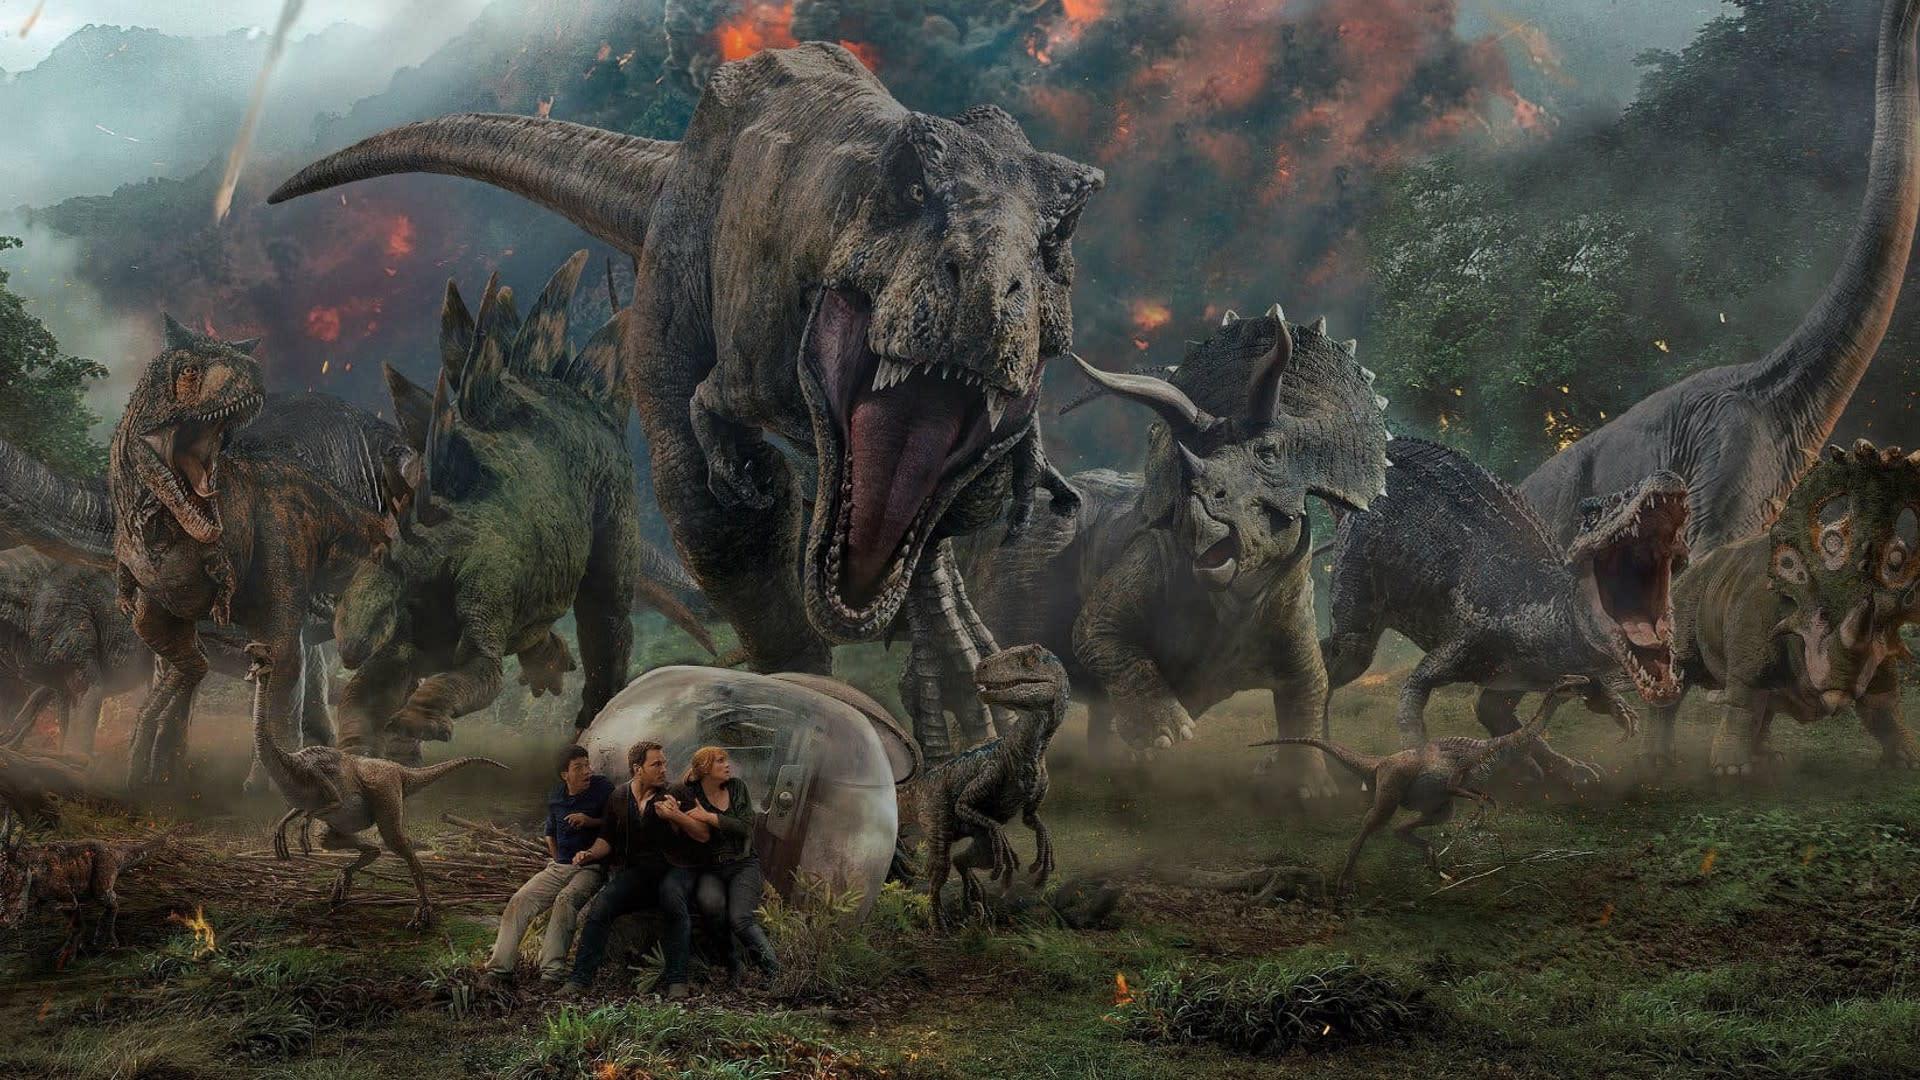 Jurassic World: Dominion will start new era for franchise